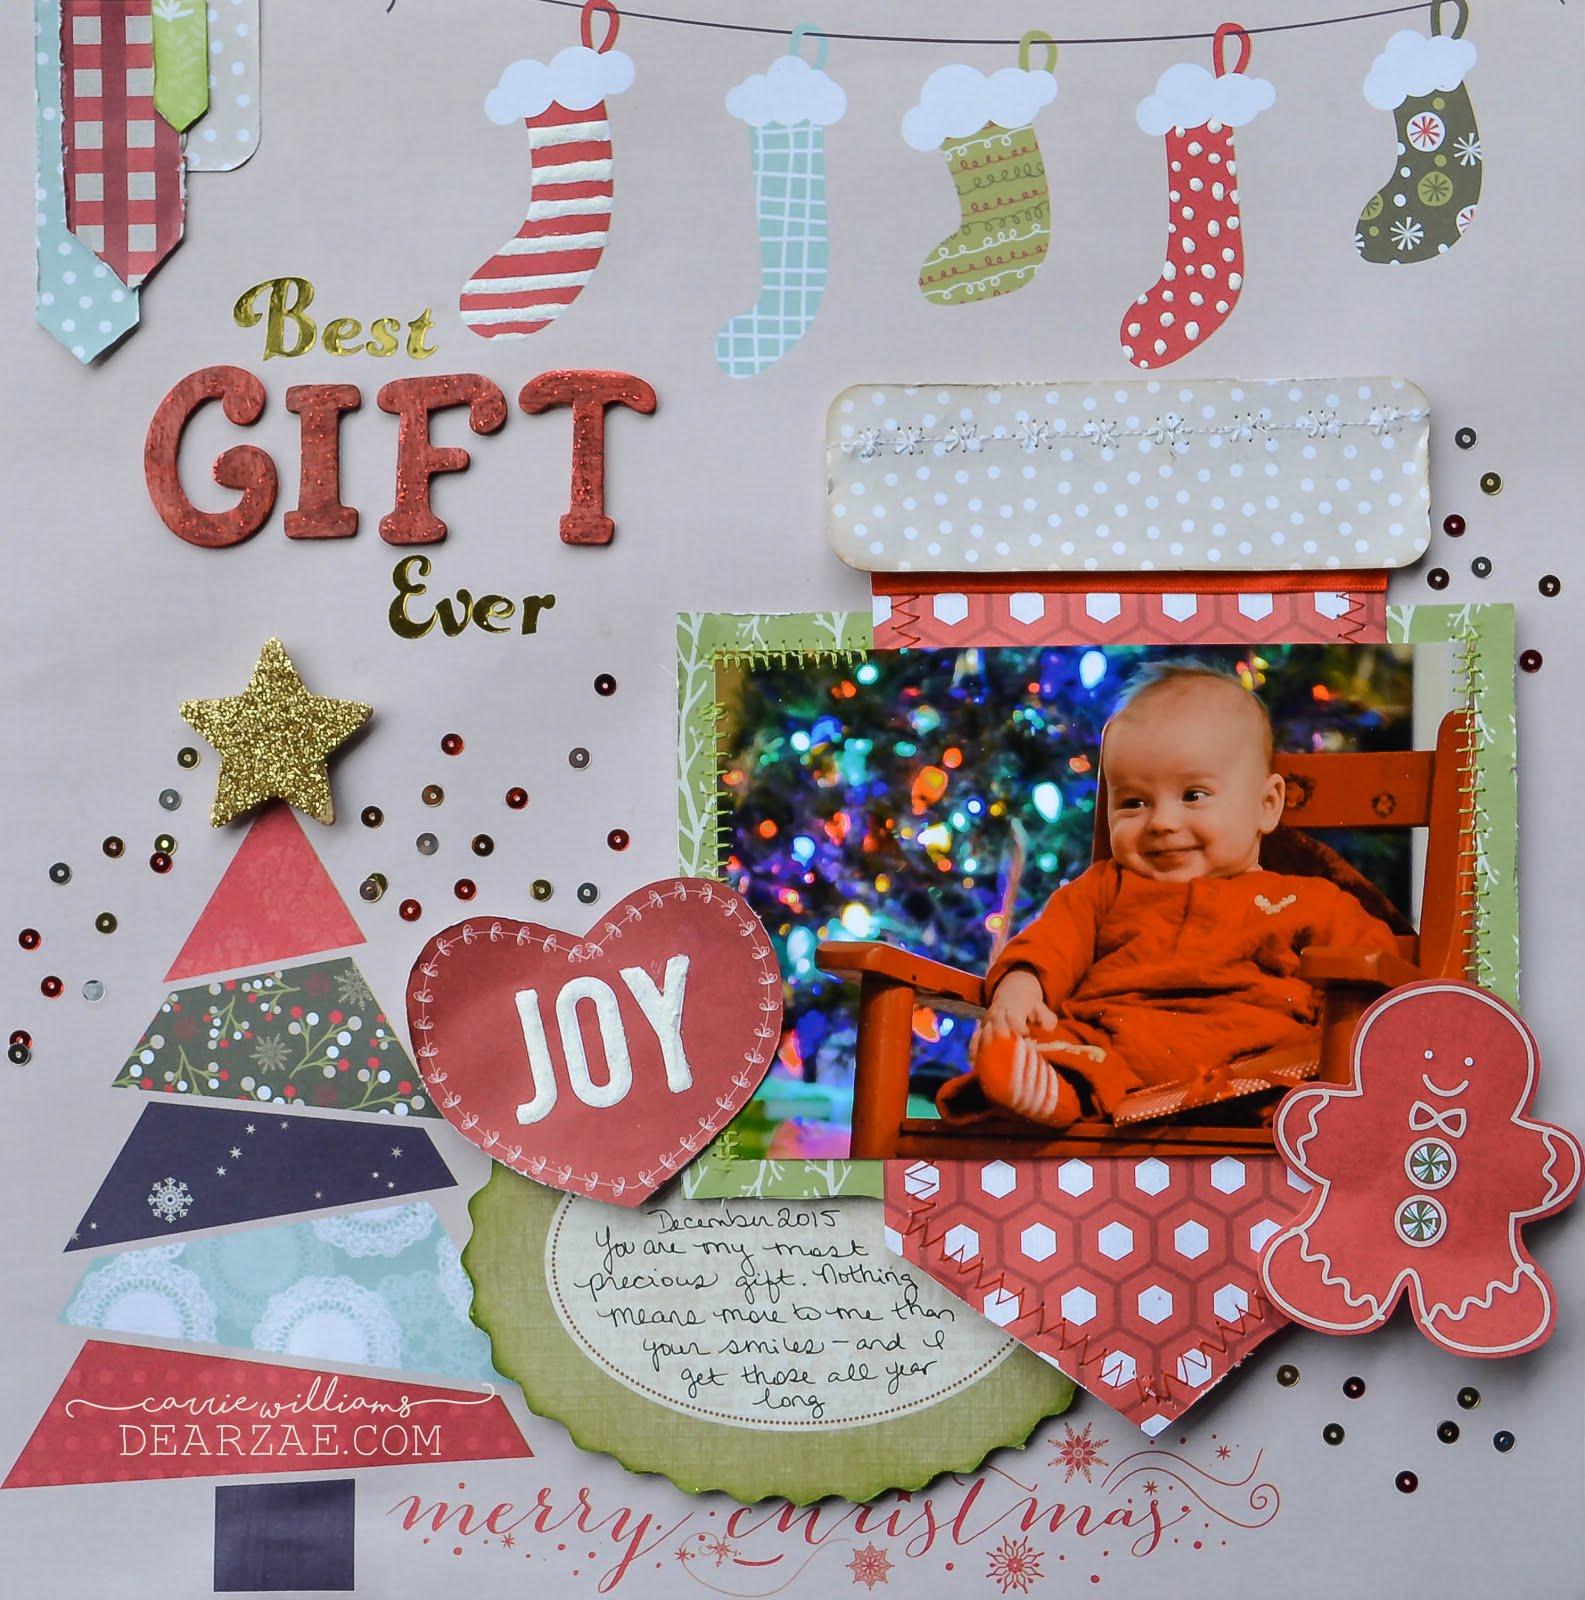 Best Gift Ever: SOS Tic Tac Toe - Dear Zae Scrapbooking Blog